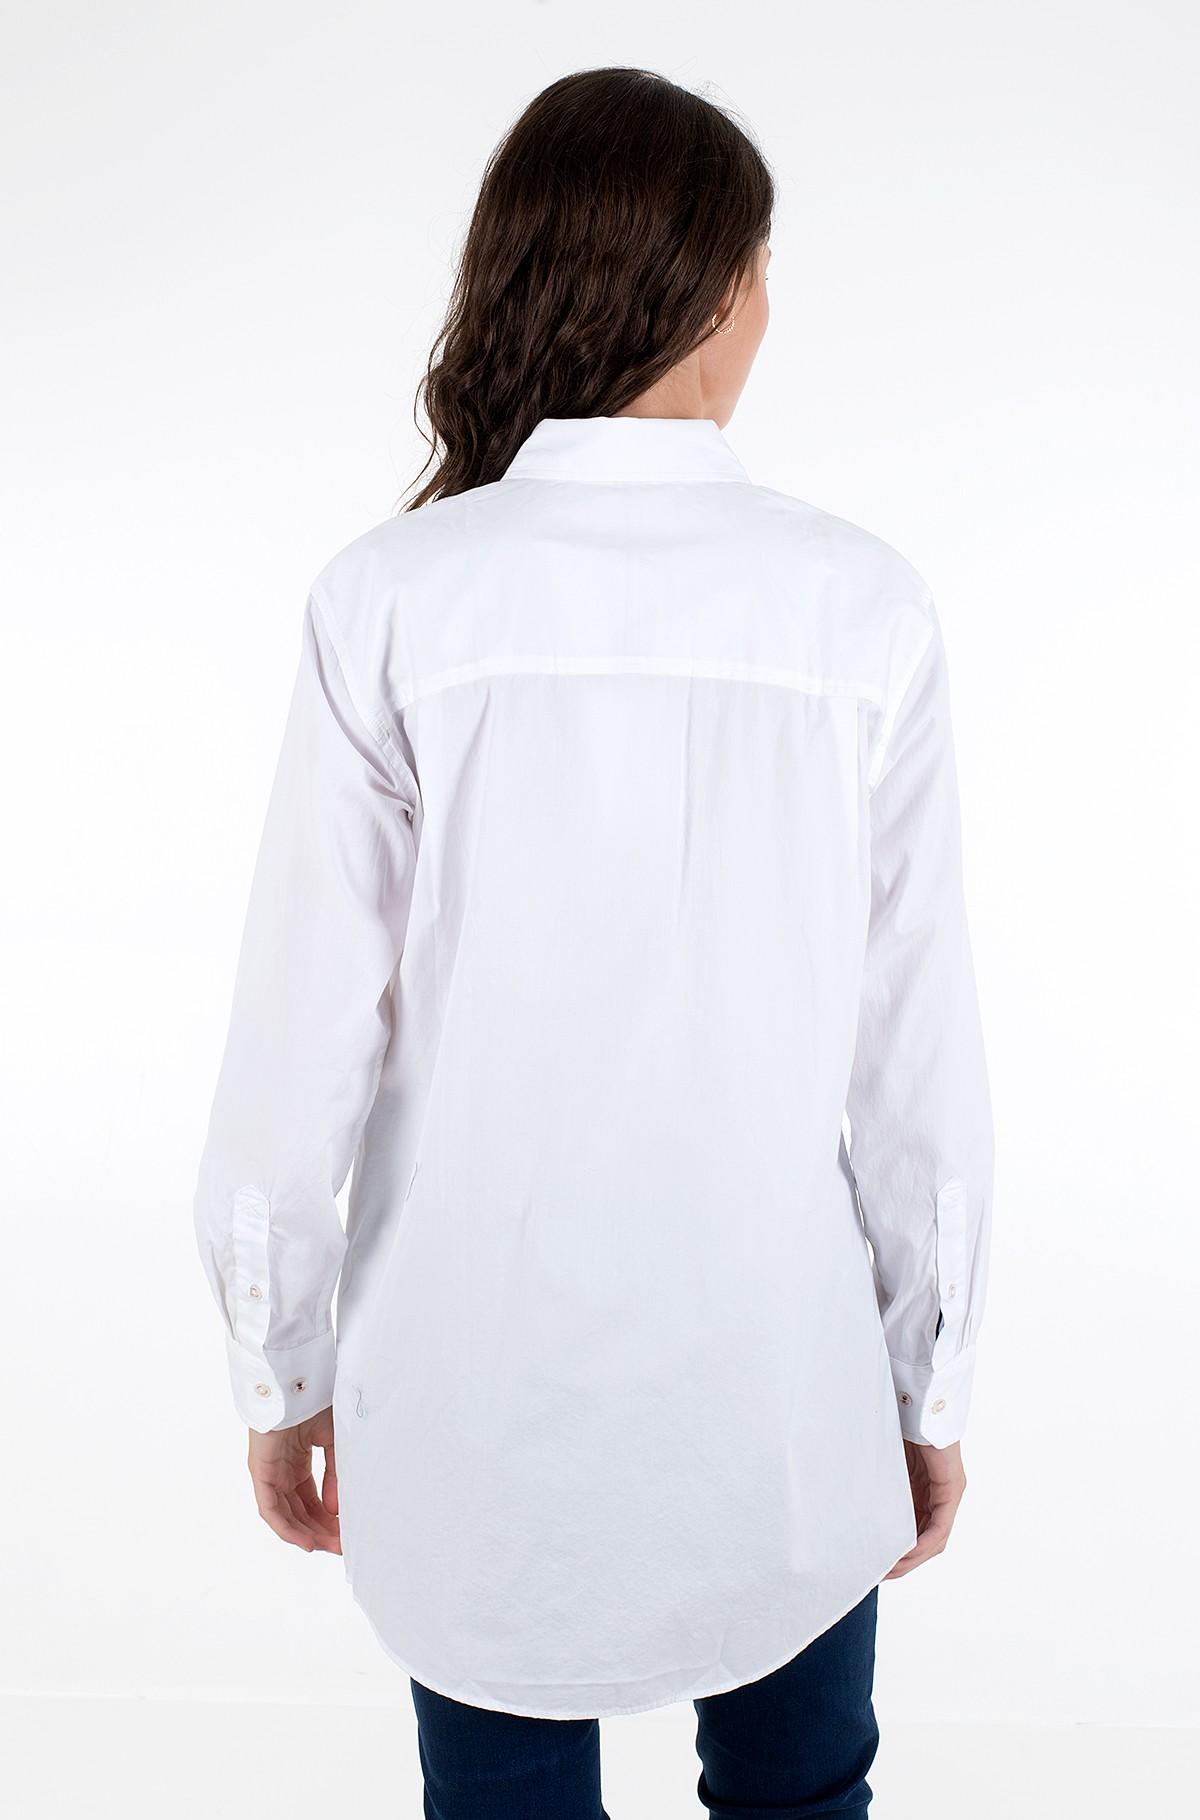 Shirt ICON TEDDY SHIRT LS W5-full-2